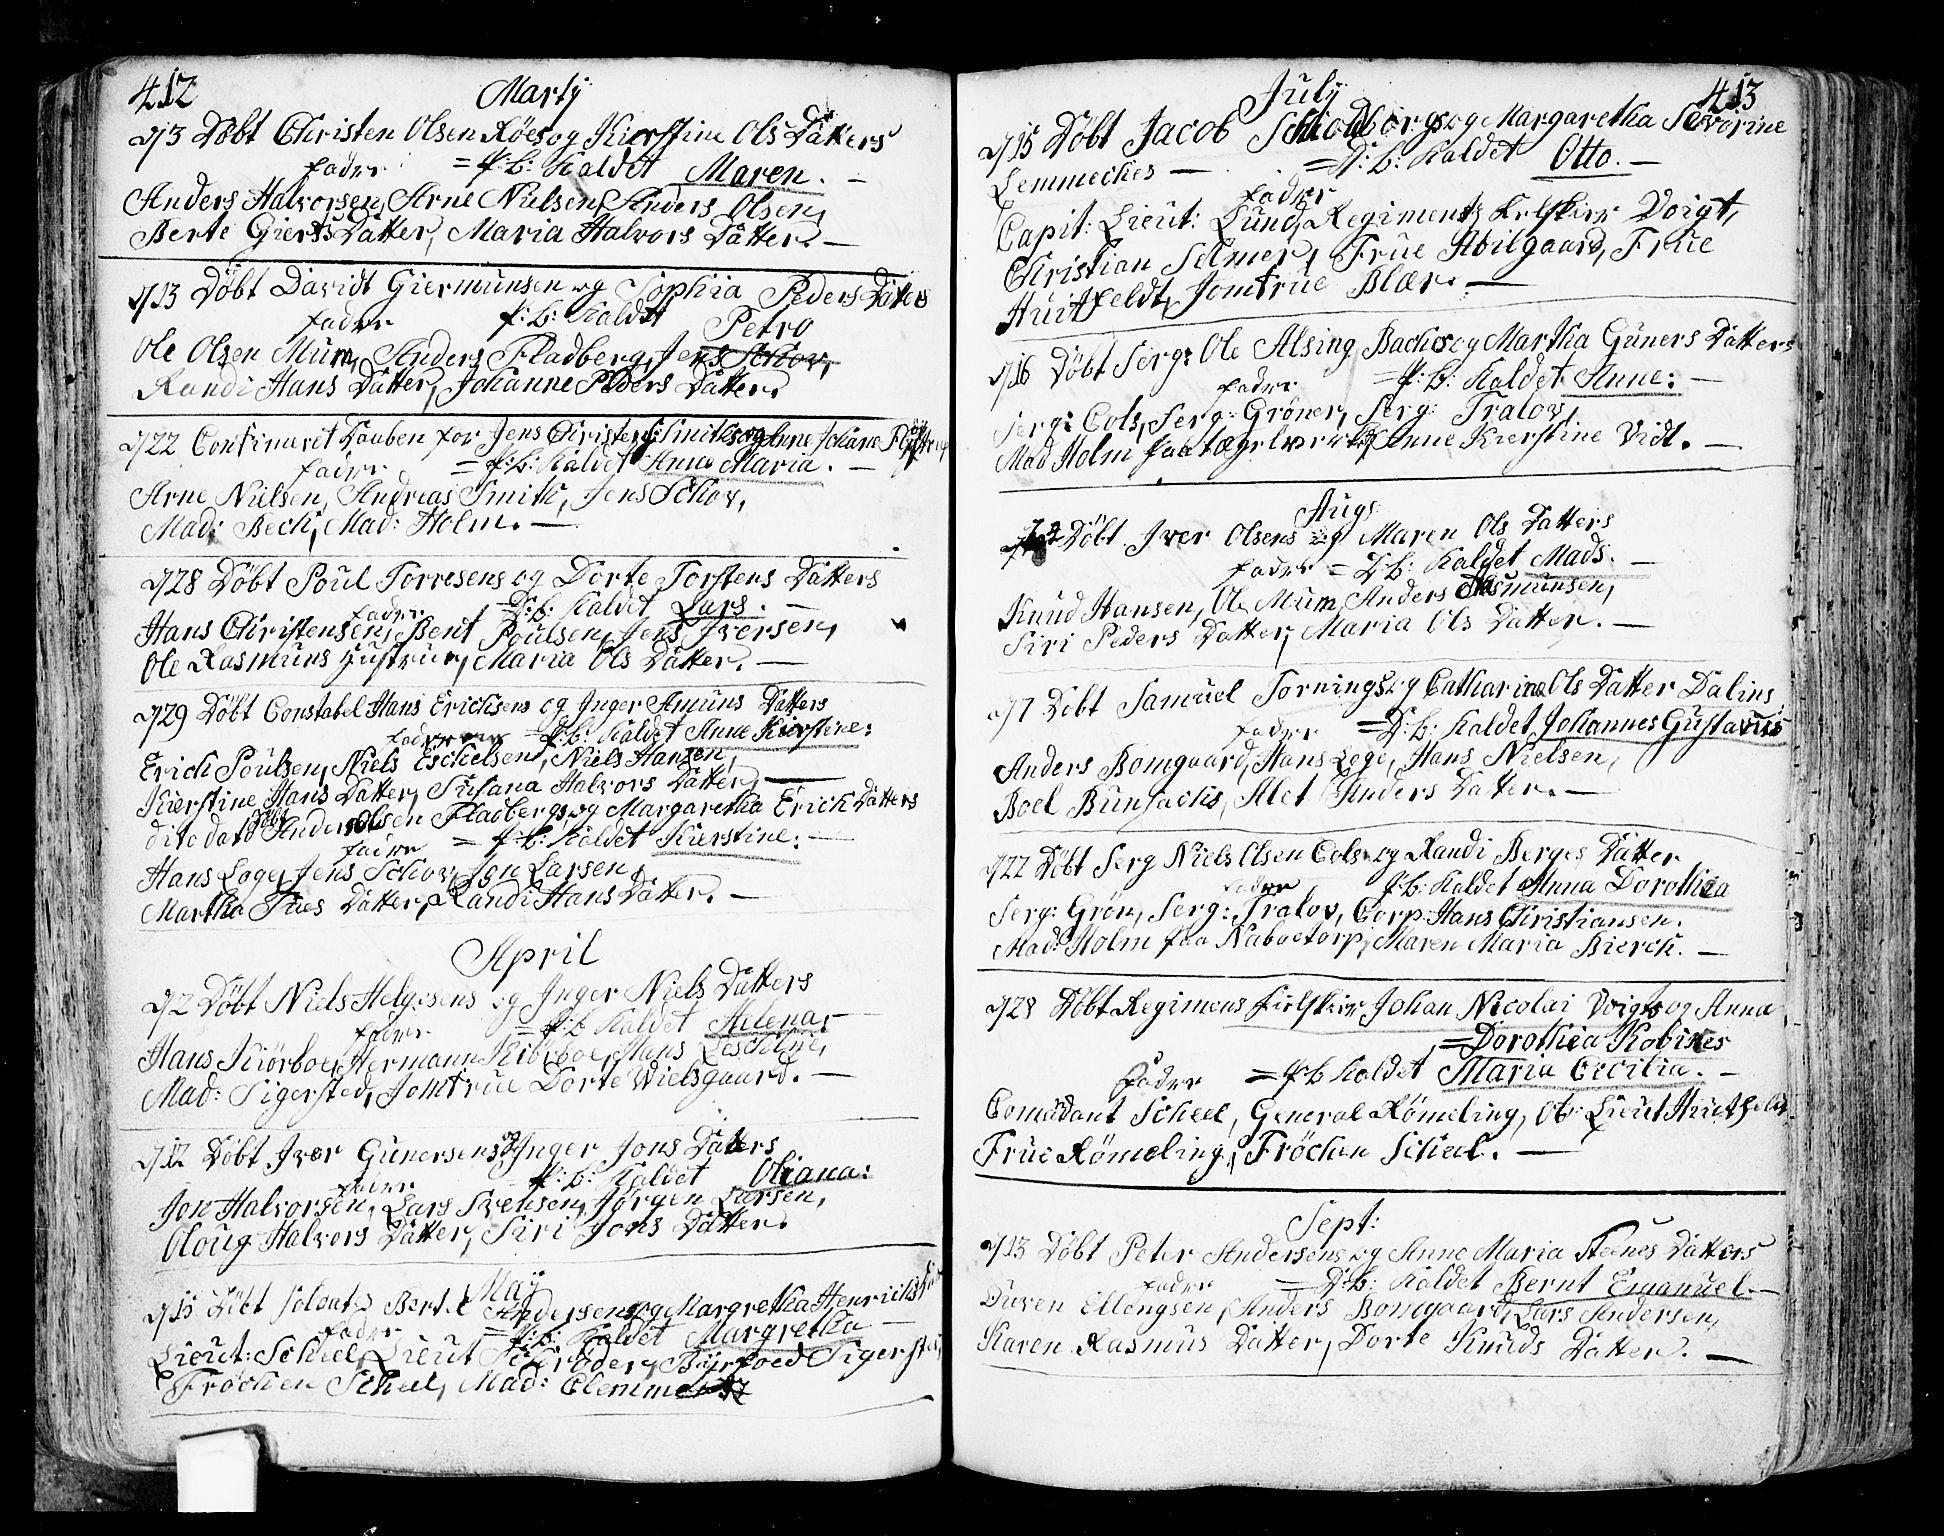 SAO, Fredrikstad prestekontor Kirkebøker, F/Fa/L0002: Ministerialbok nr. 2, 1750-1804, s. 412-413